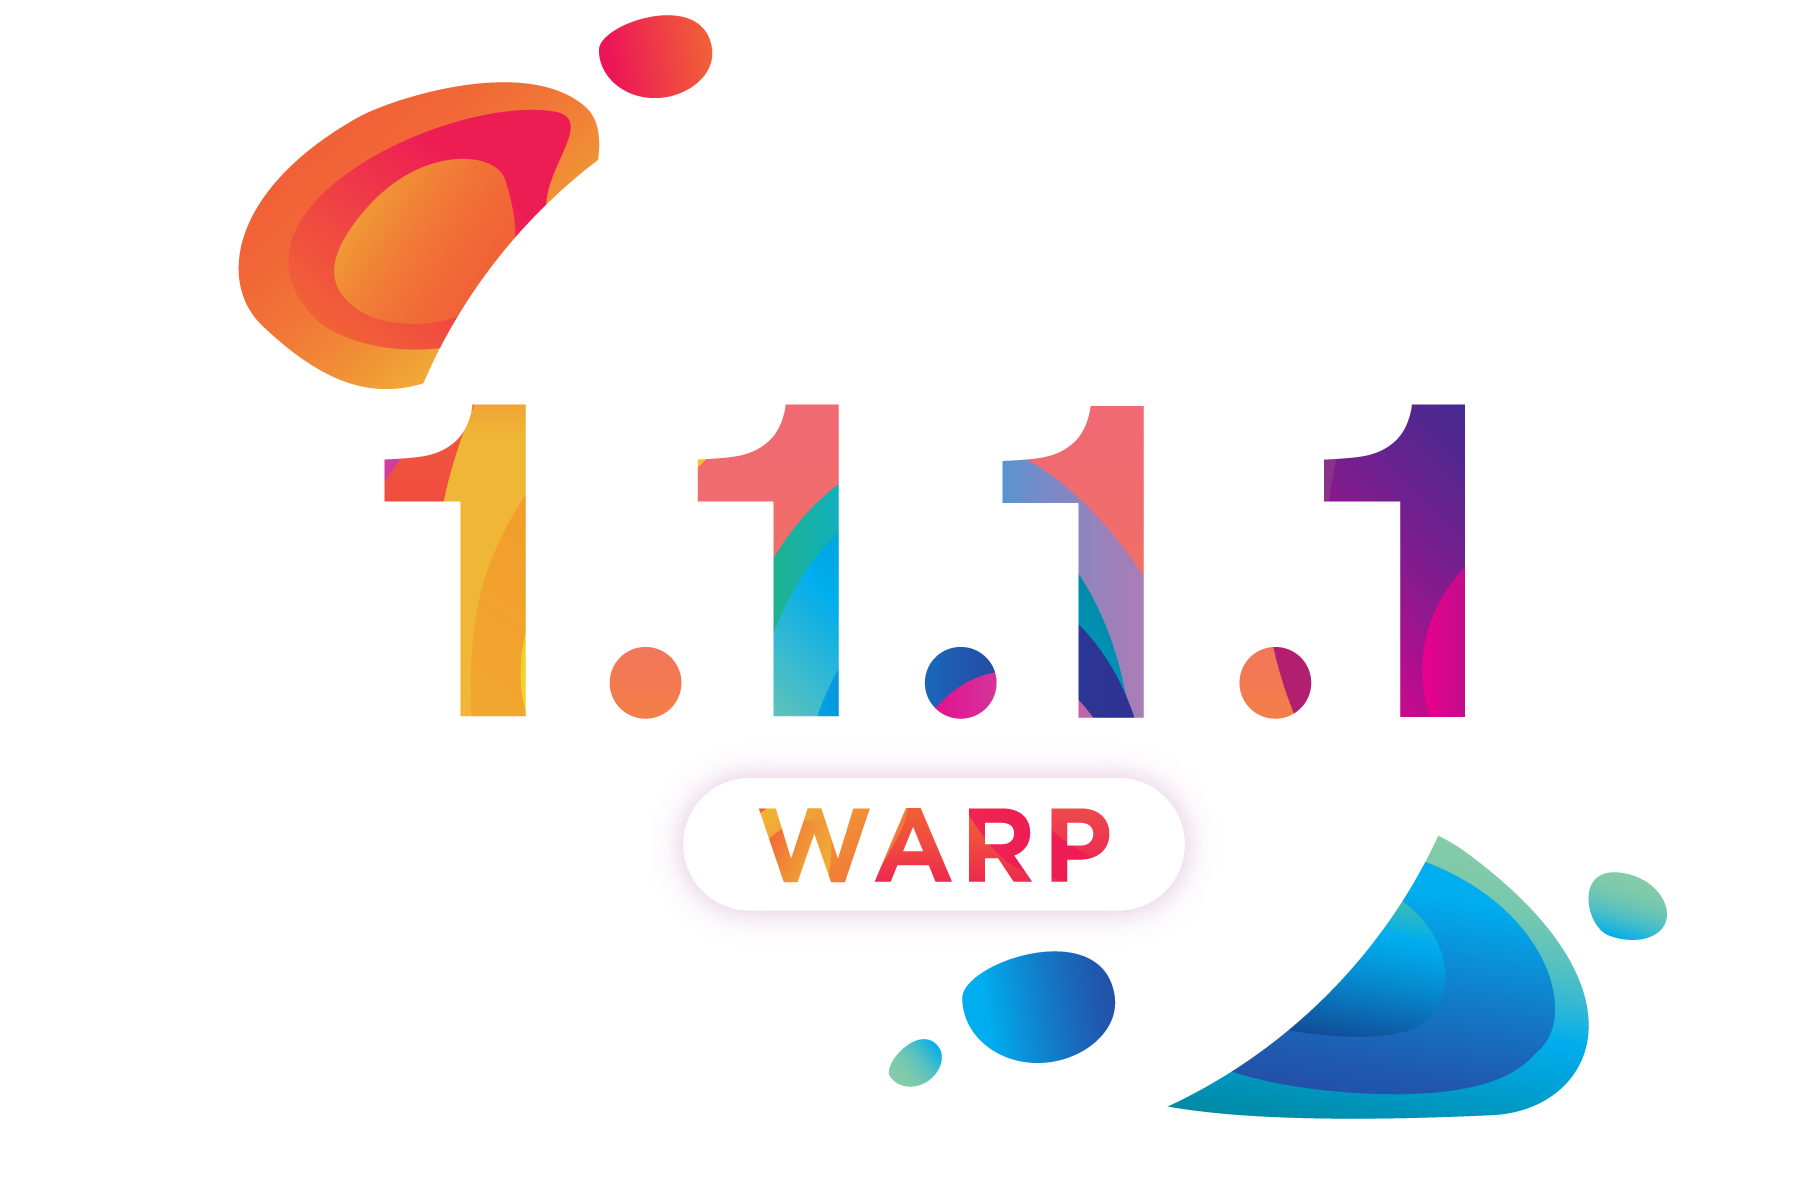 Cloudflare unveils Warp, their new free VPN | VPNservice com